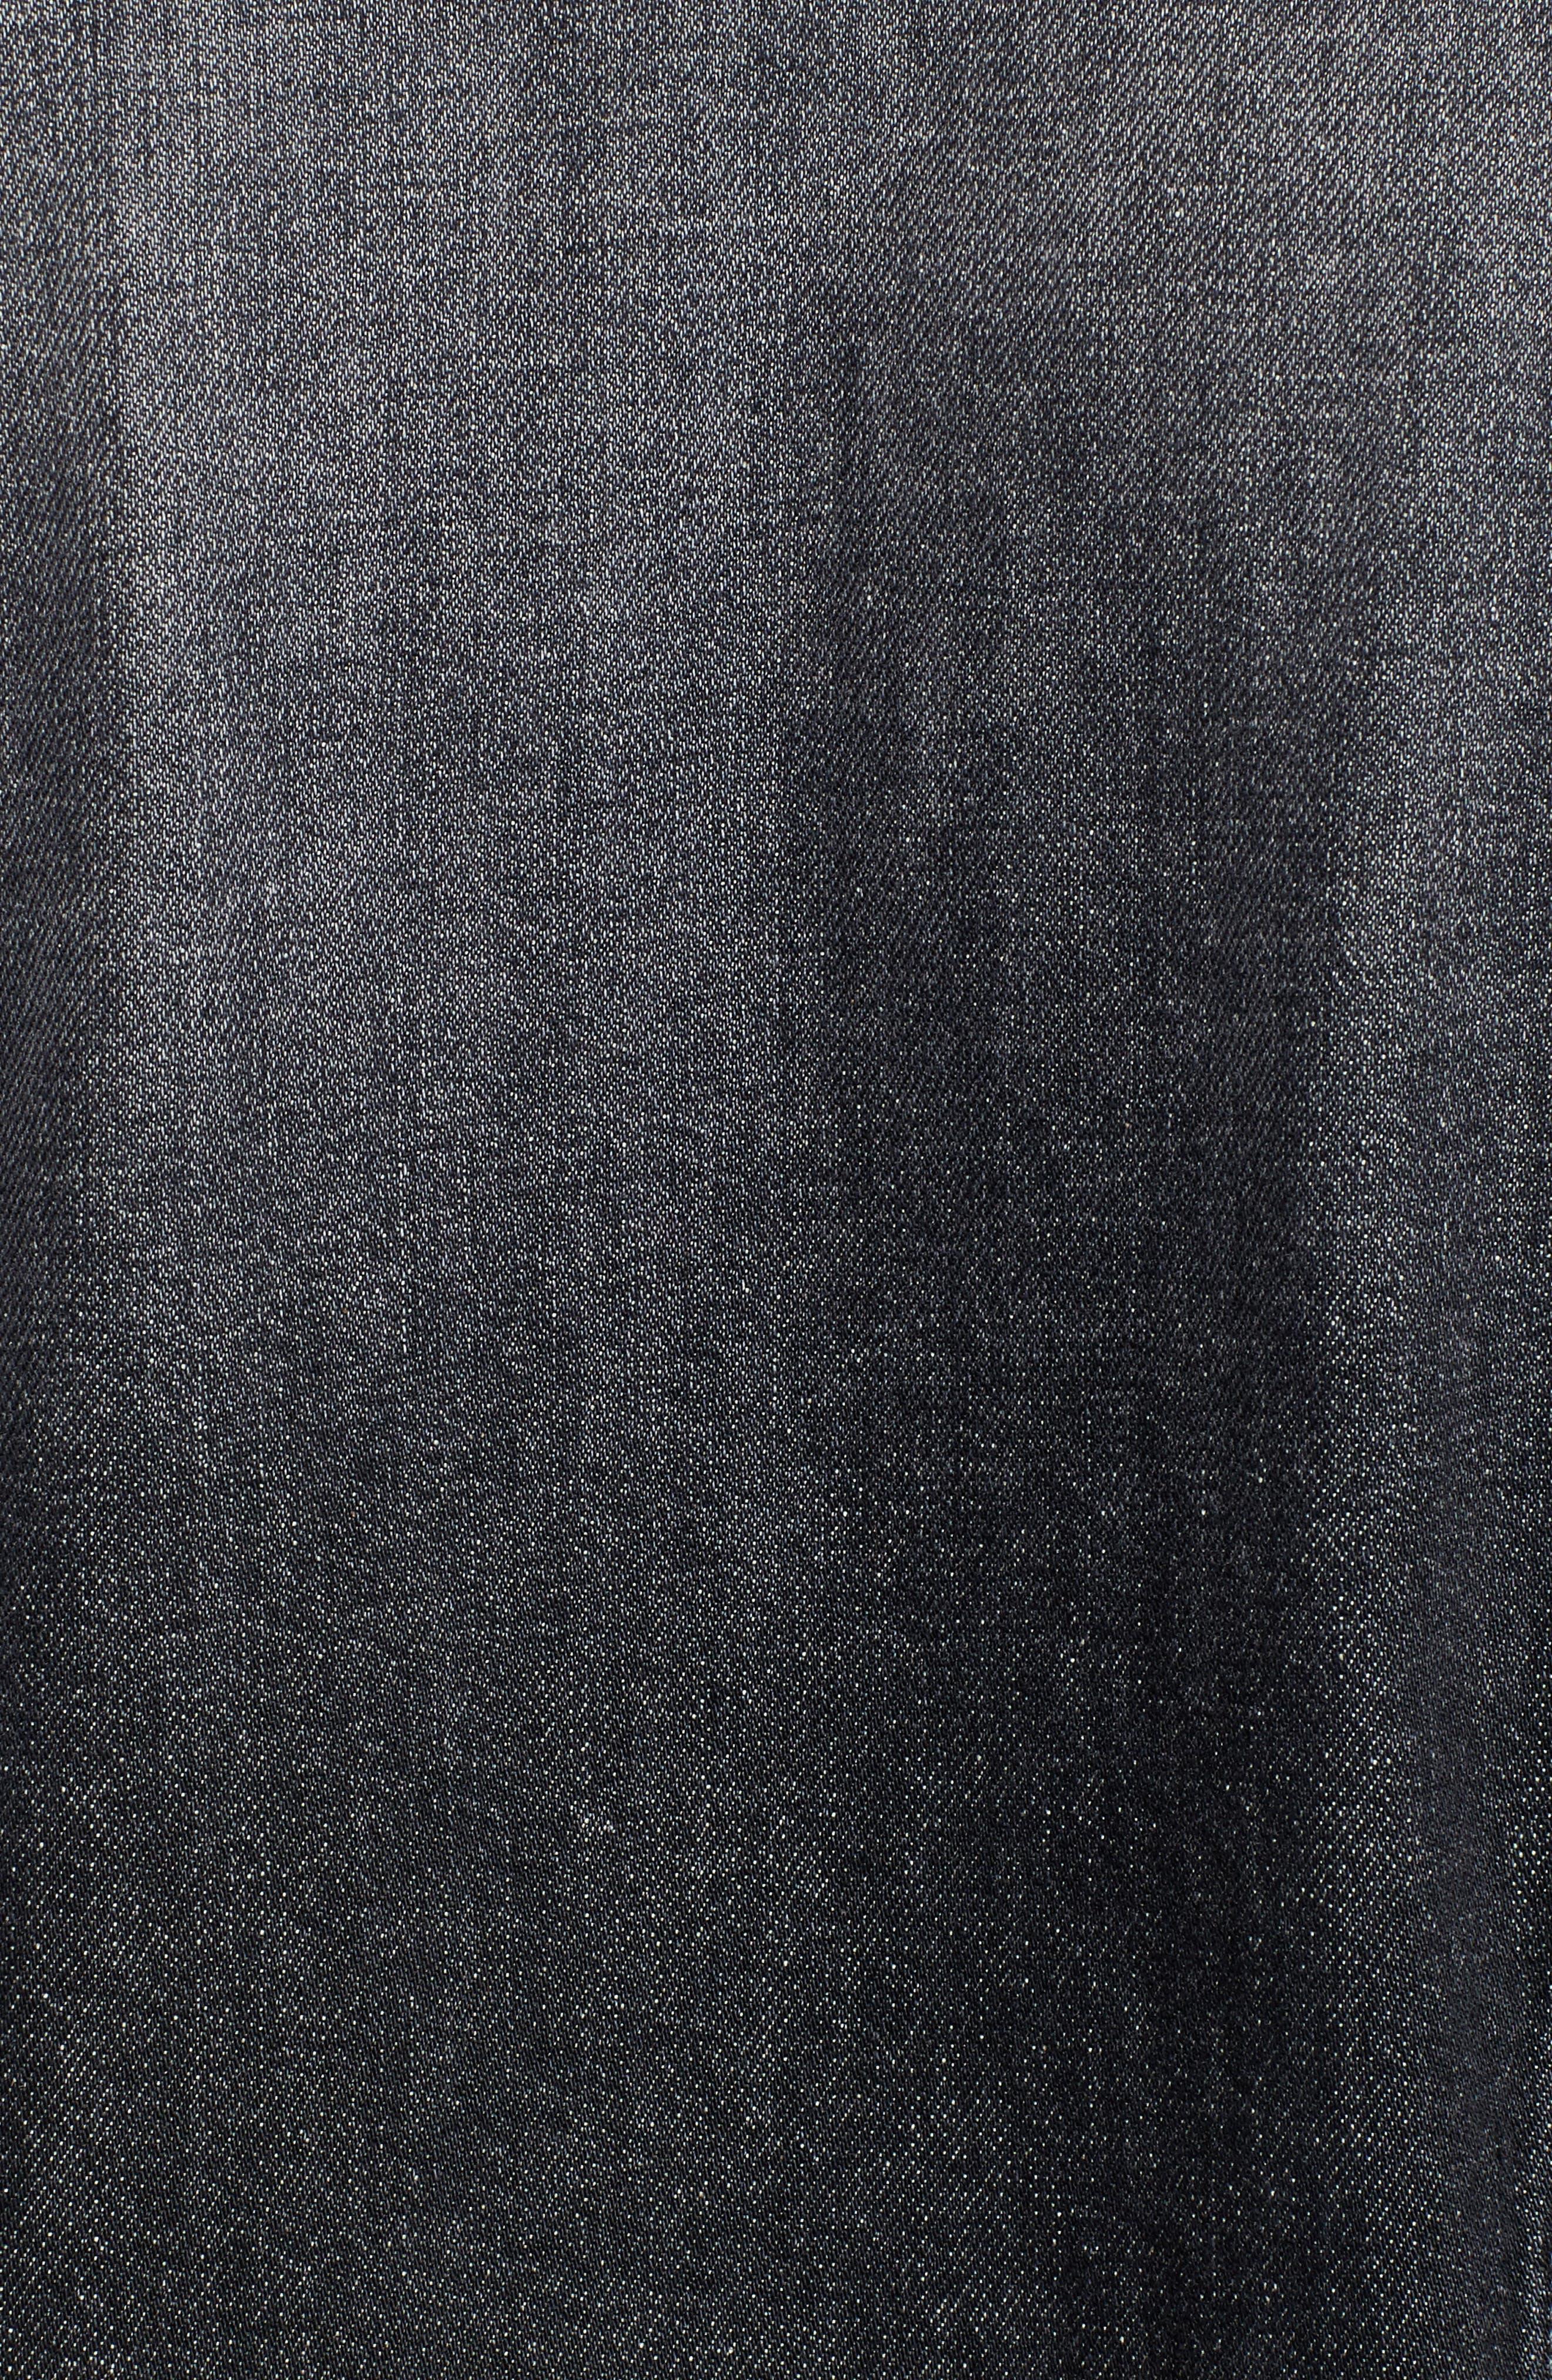 Denim Jacket,                             Alternate thumbnail 6, color,                             004